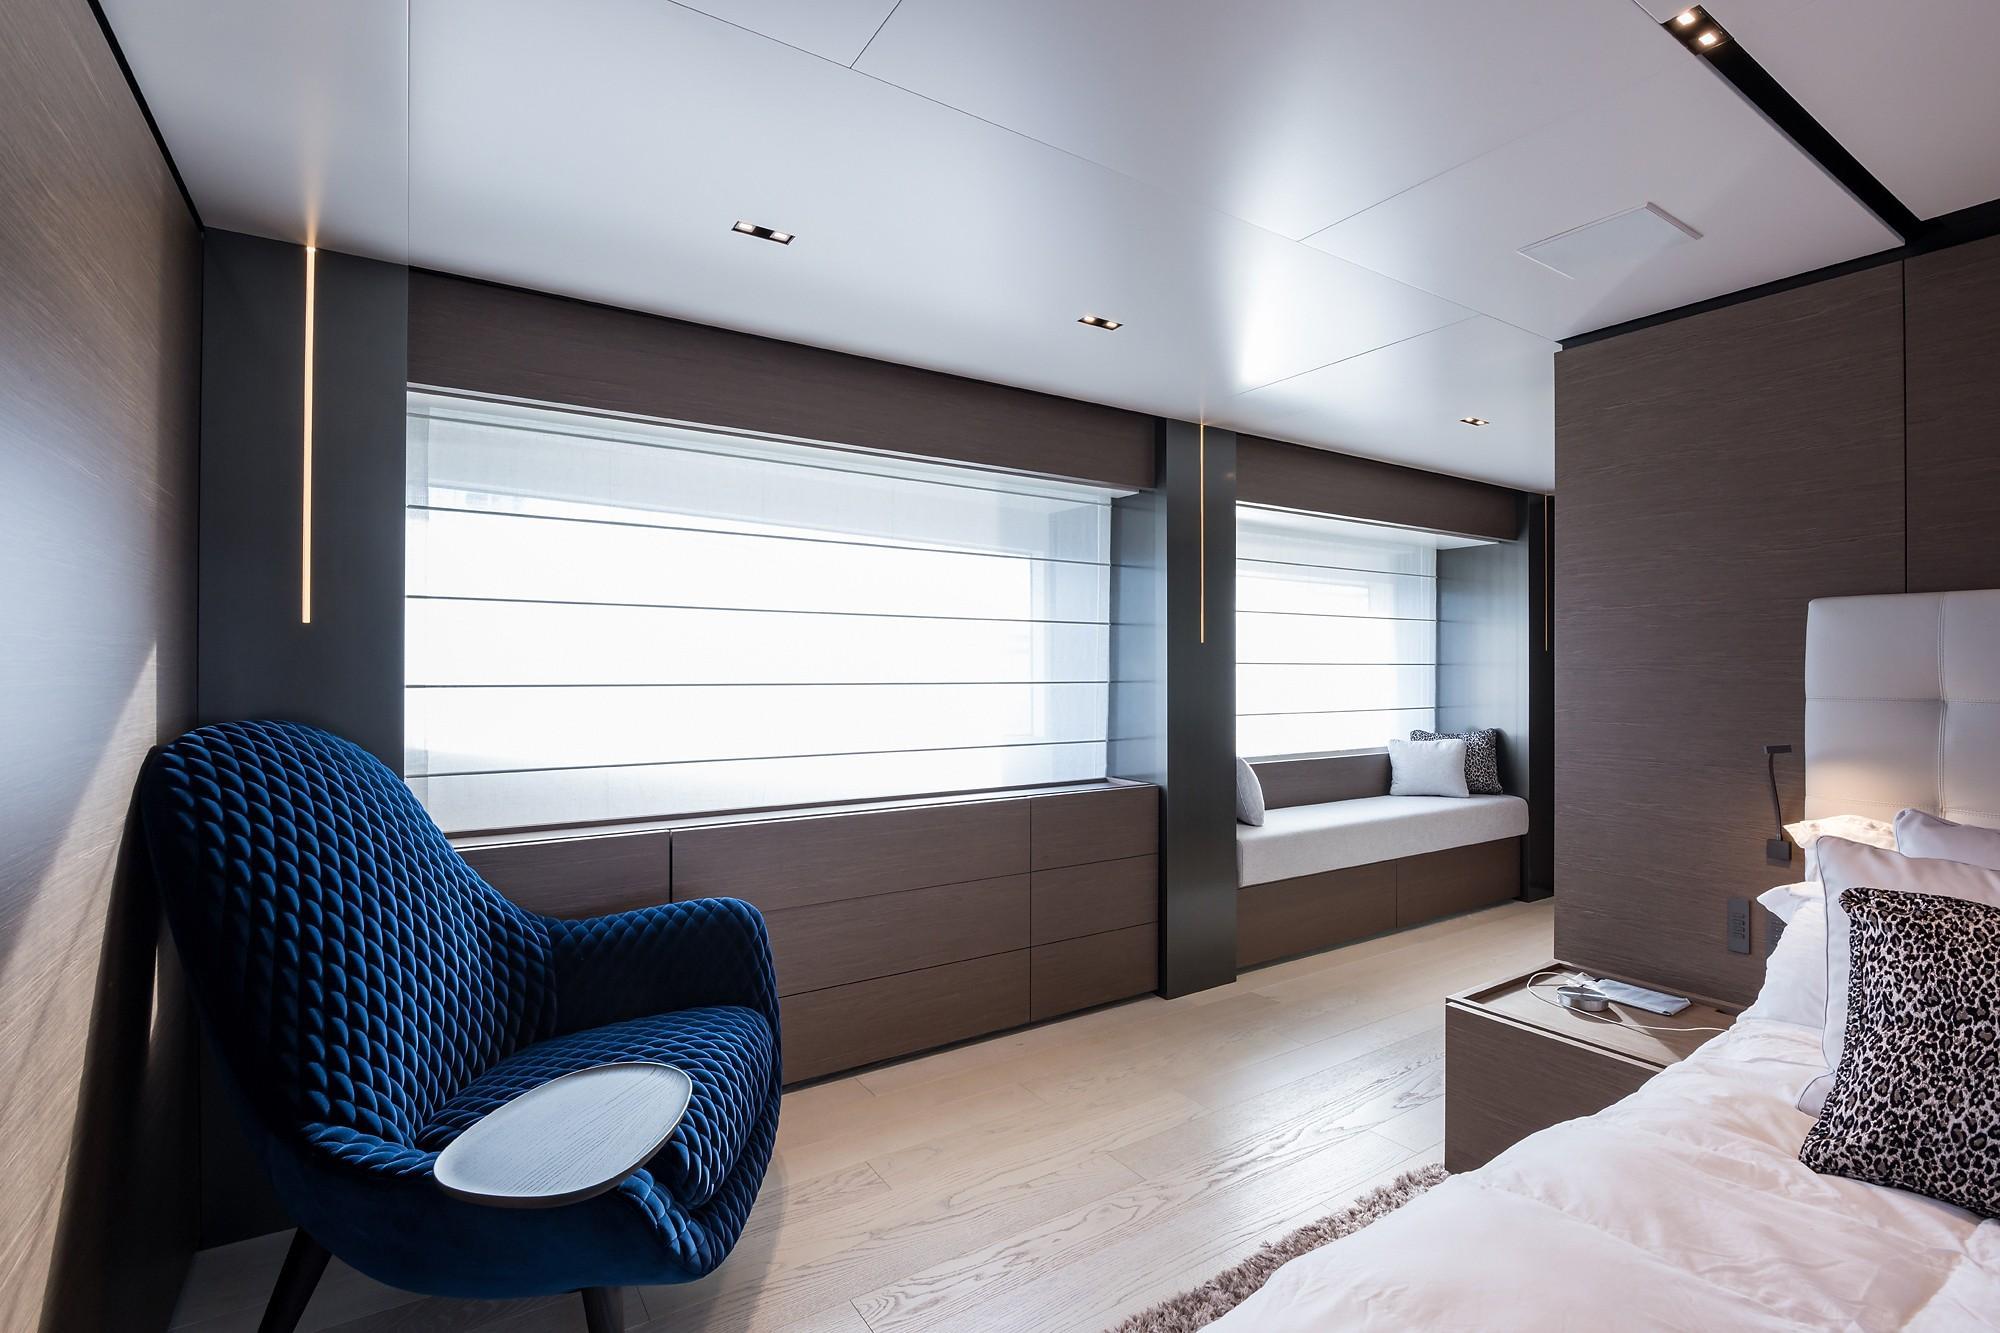 2018 Custom Line Navetta 33 M - Master Cabin Sitting